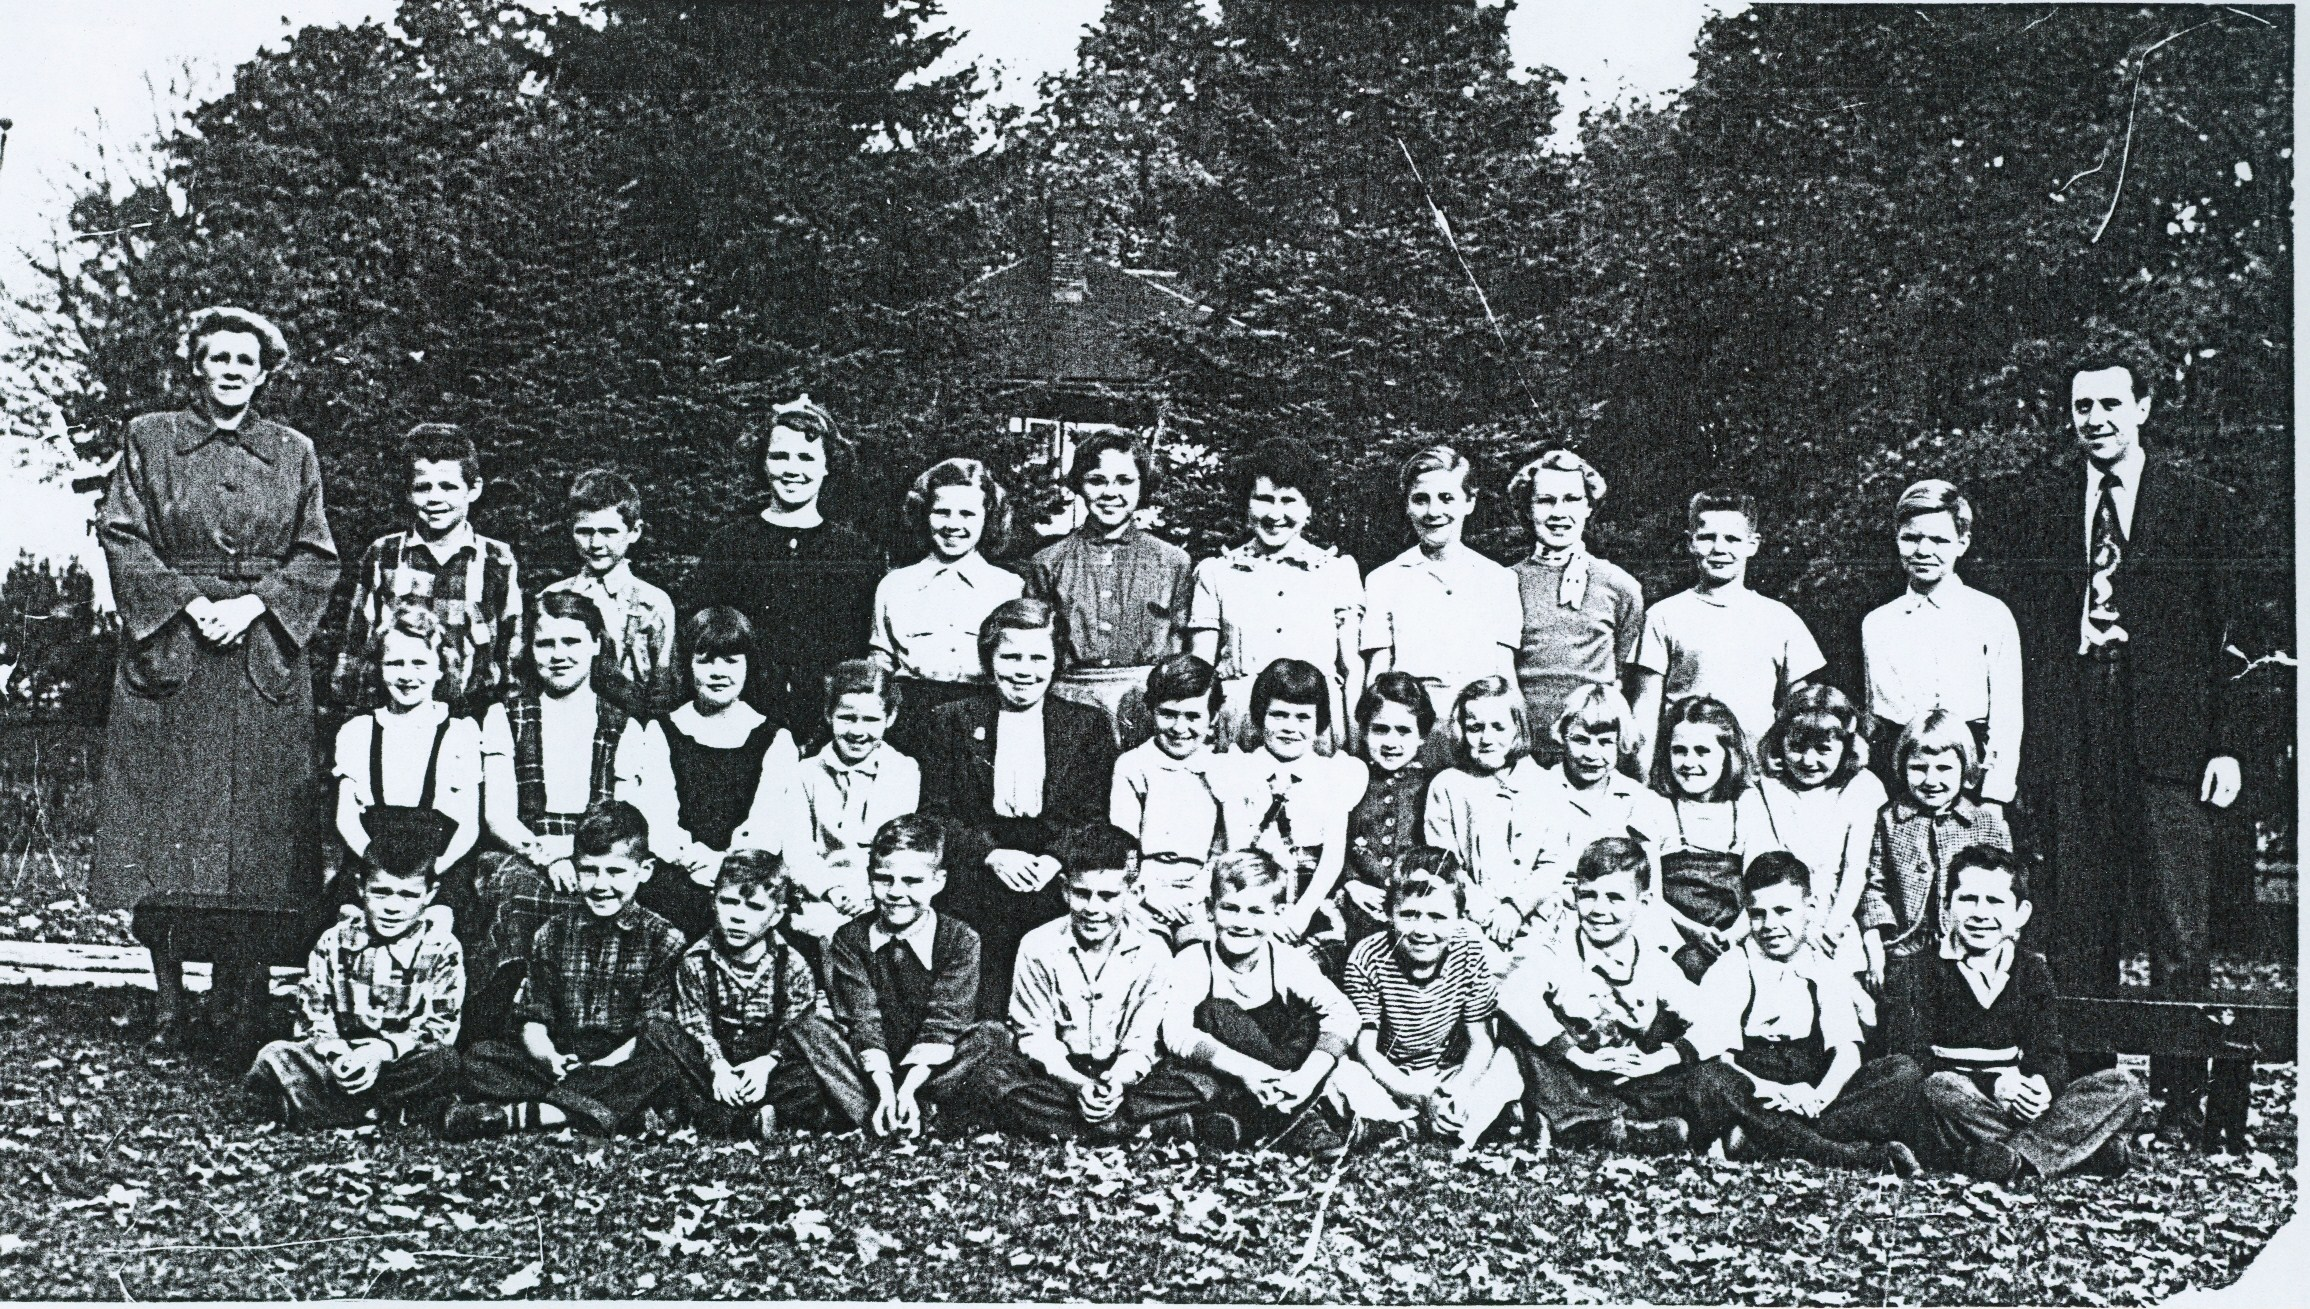 Deloro ublic School 1951-52